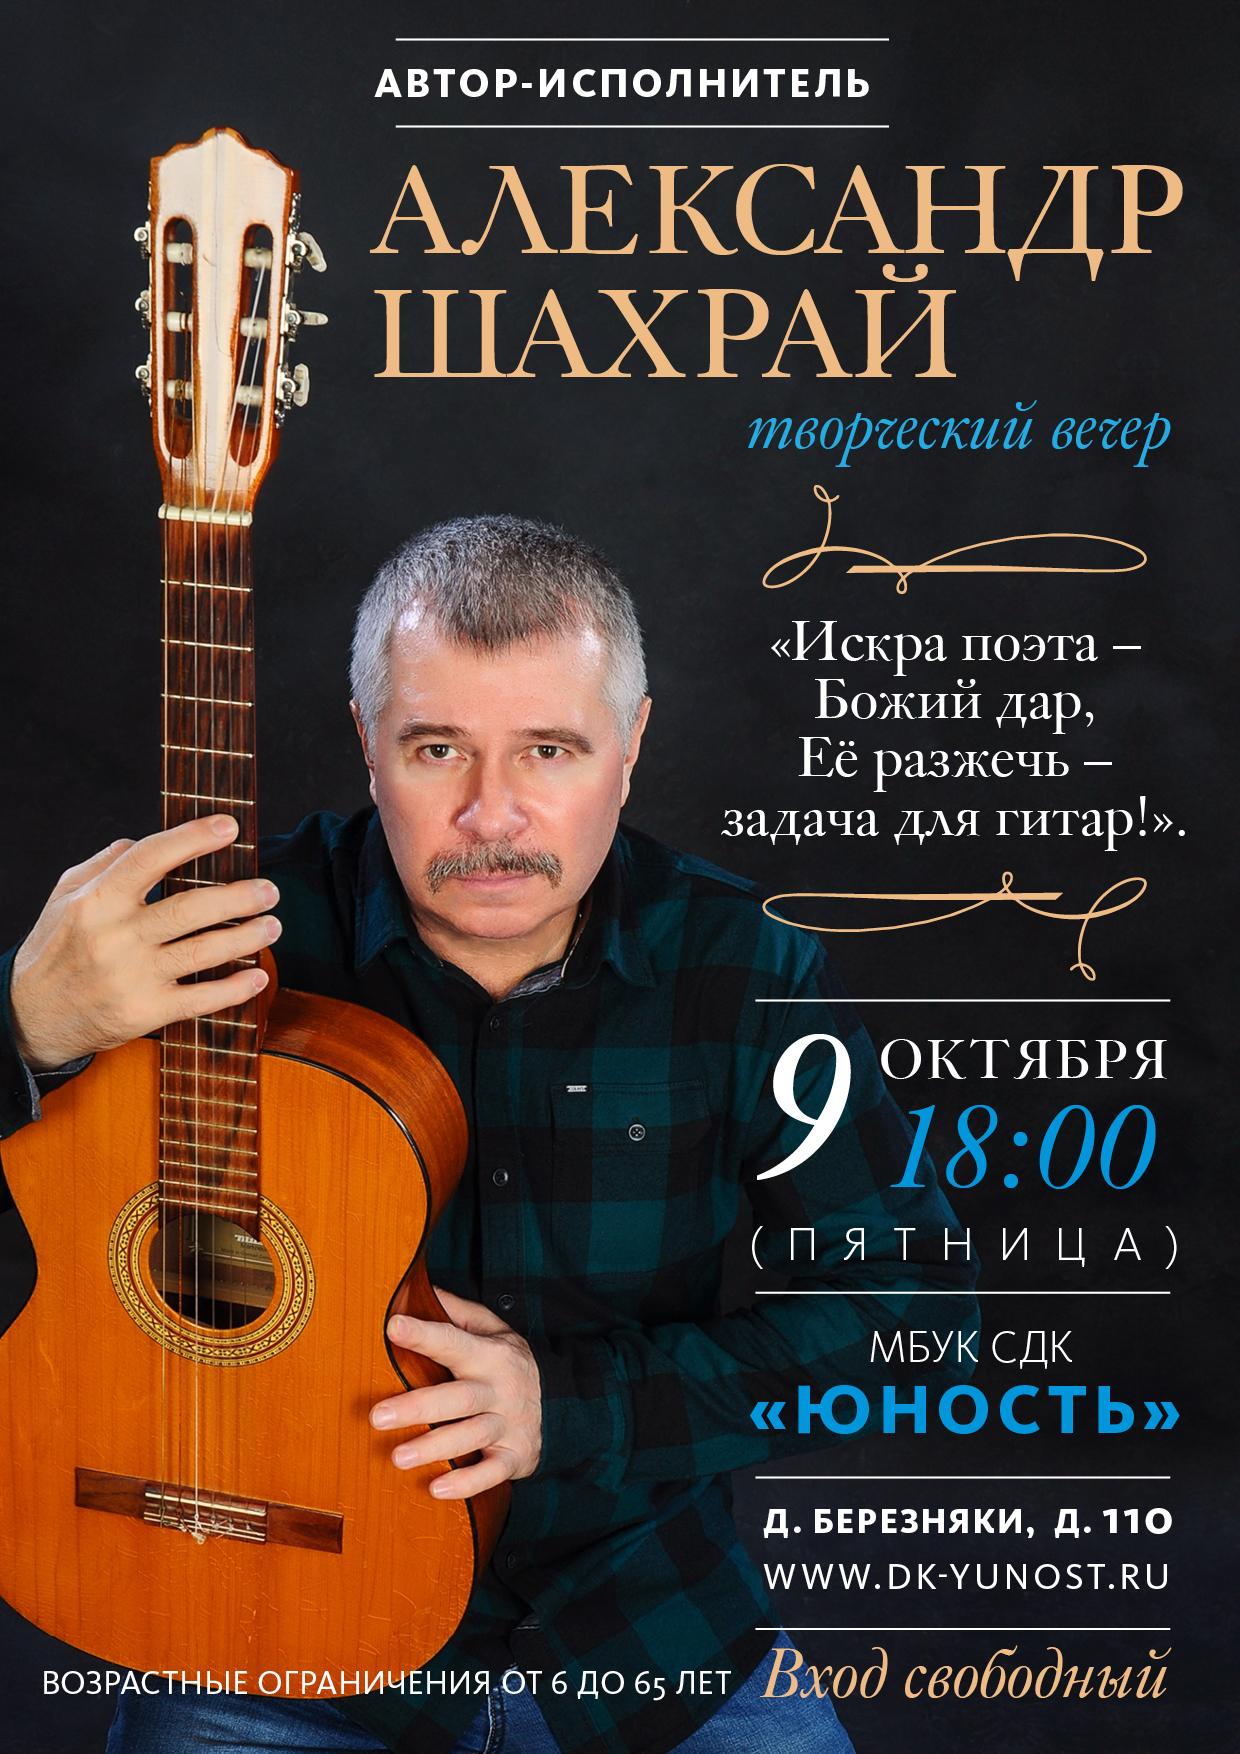 афиша к творч вечер А Шахрай - 091020 -